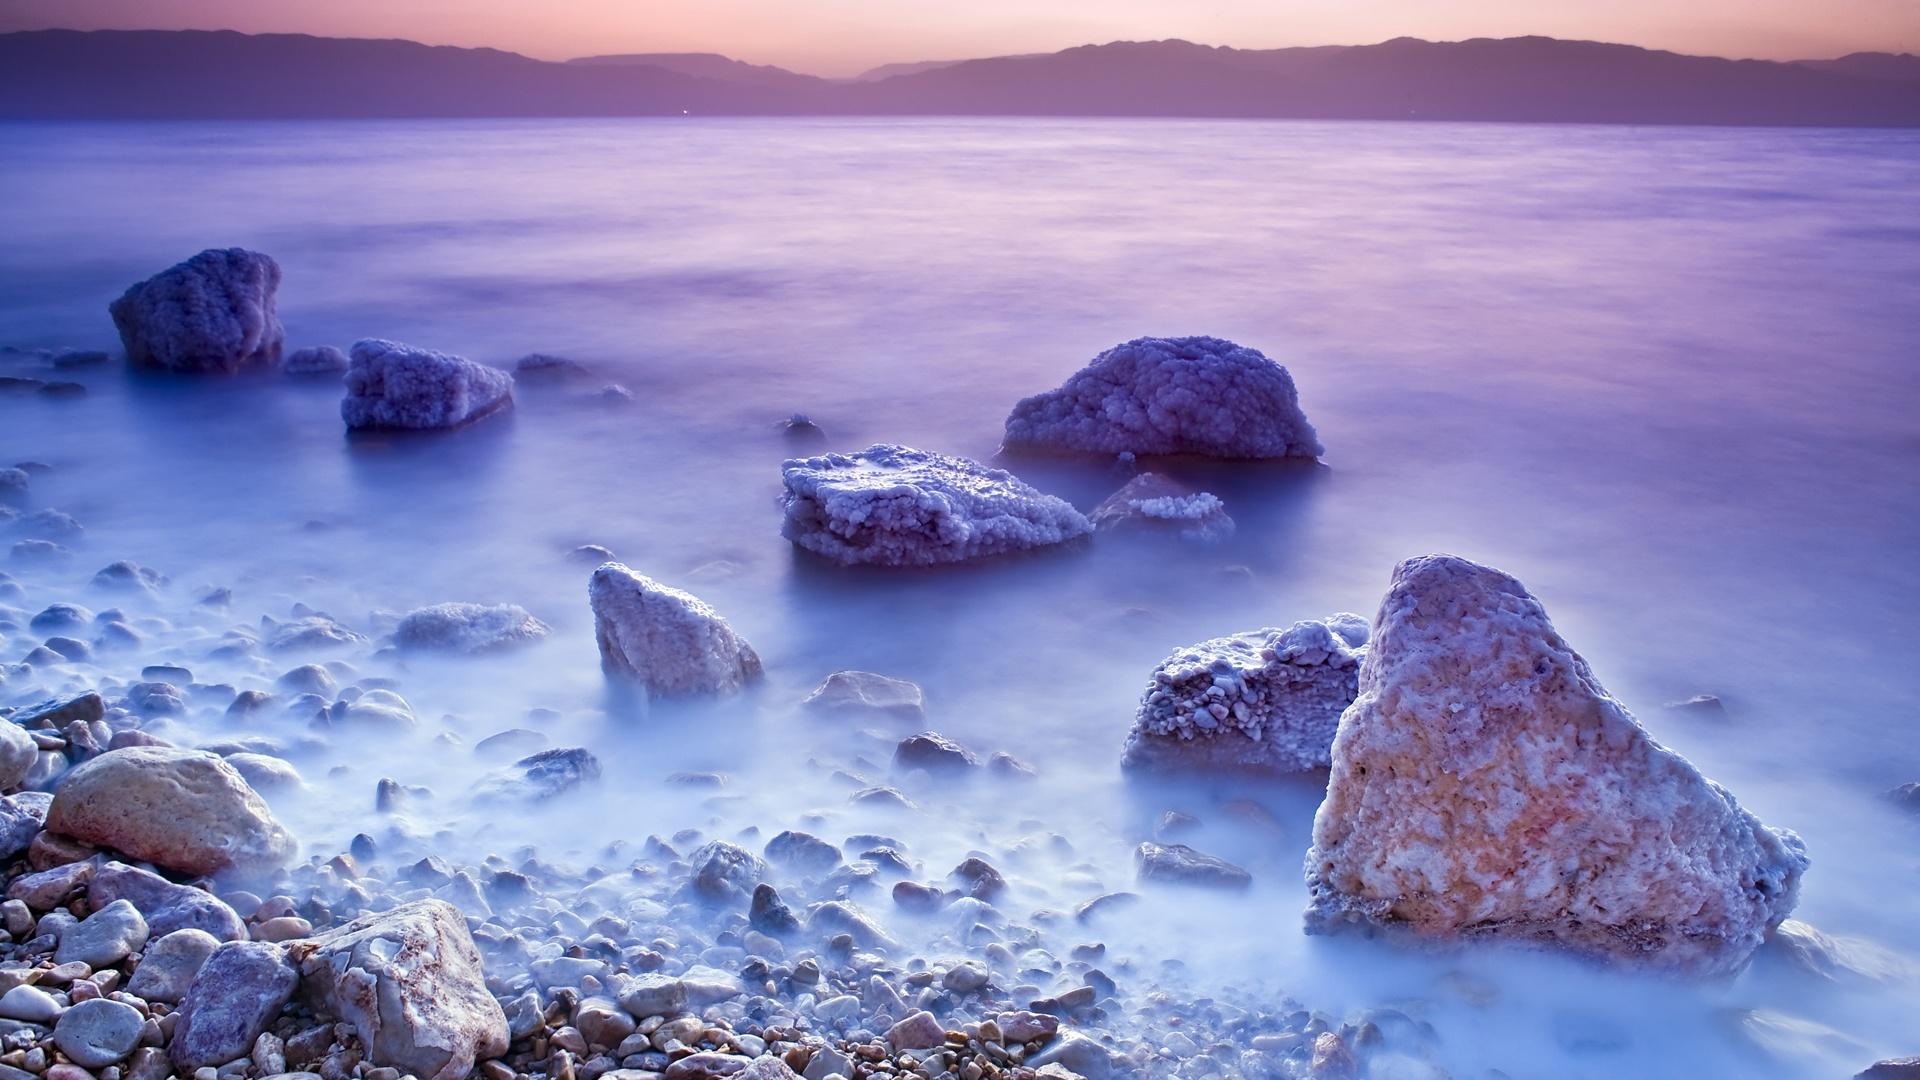 Wallpaper Dead Sea Sunset Scenery 1920x1200 Hd Picture Image